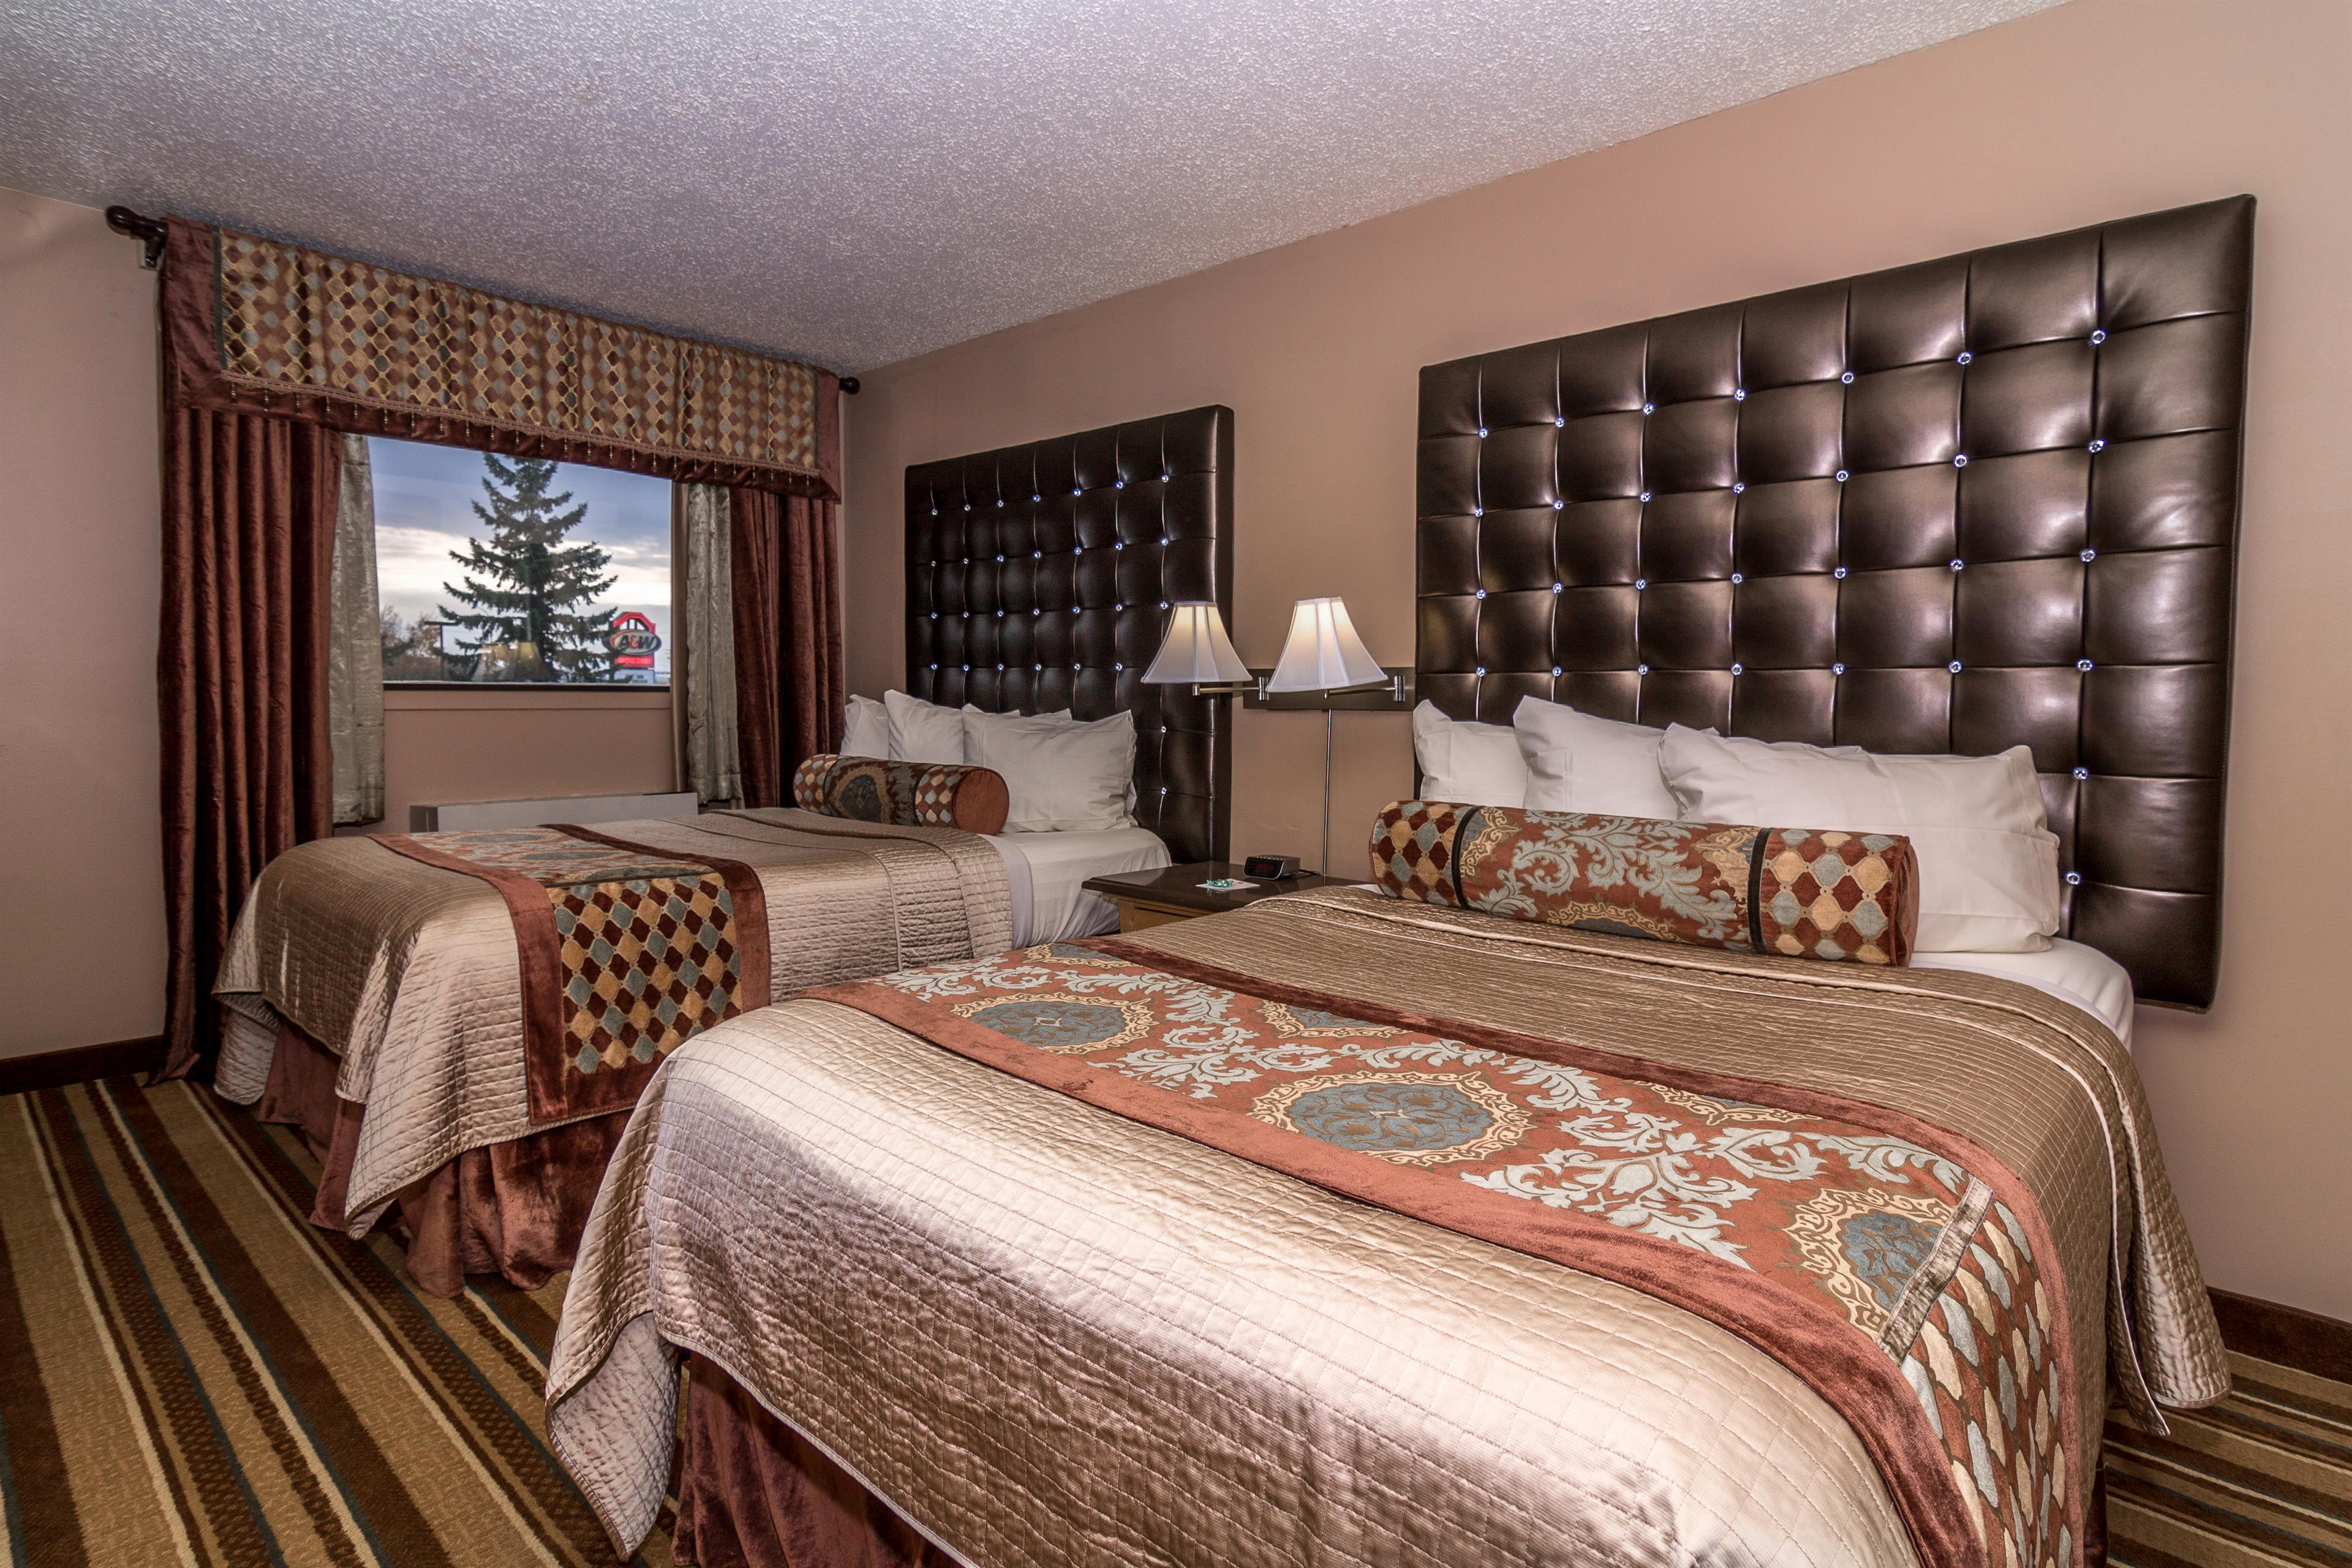 Best Western Marquis Inn & Suites in Prince Albert: Two Queen Beds